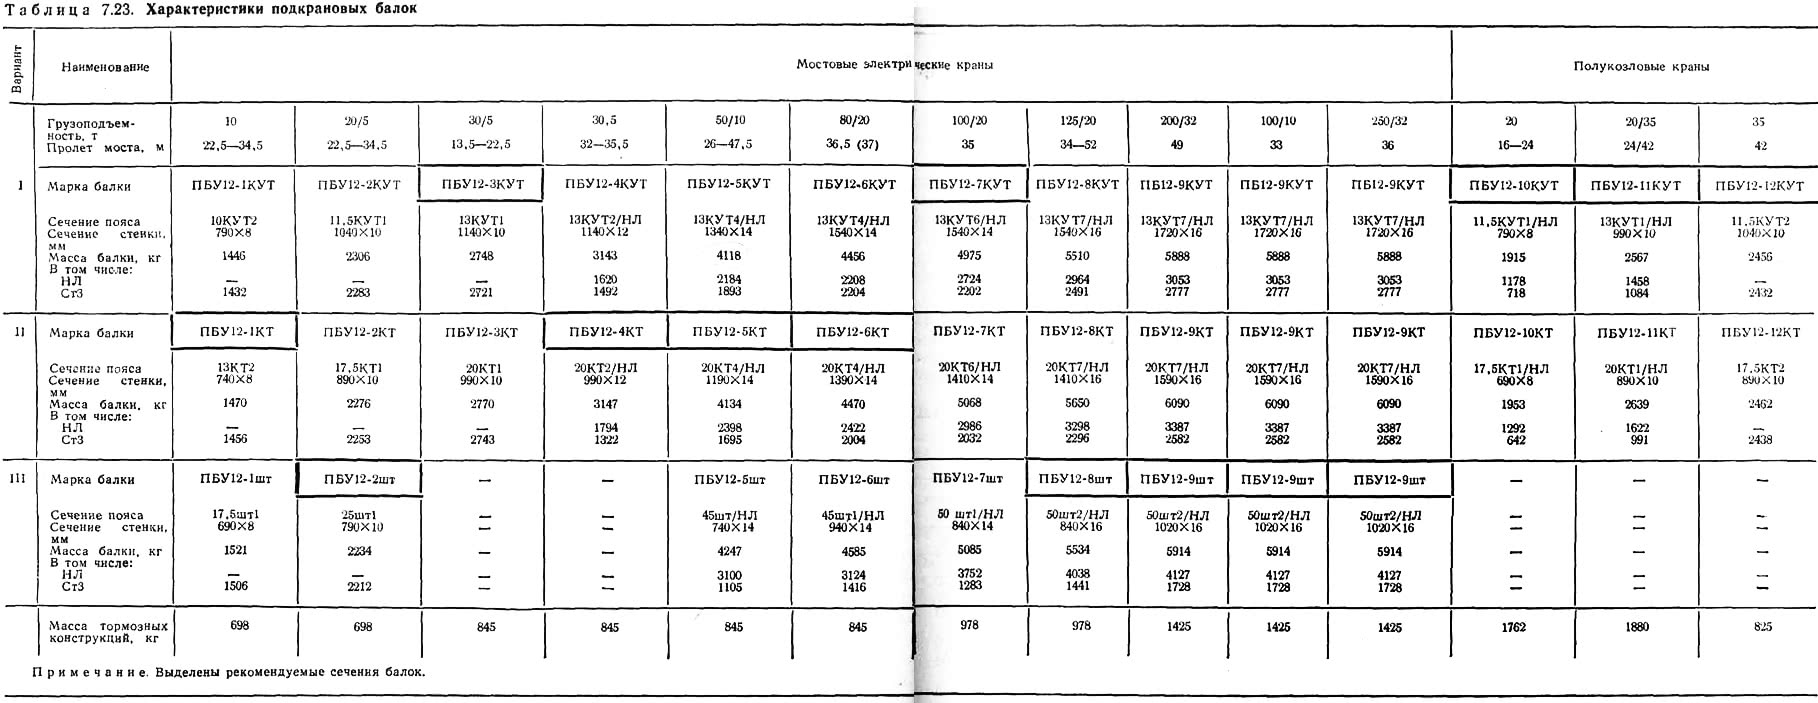 Таблица 7.23. Характеристики подкрановых балок